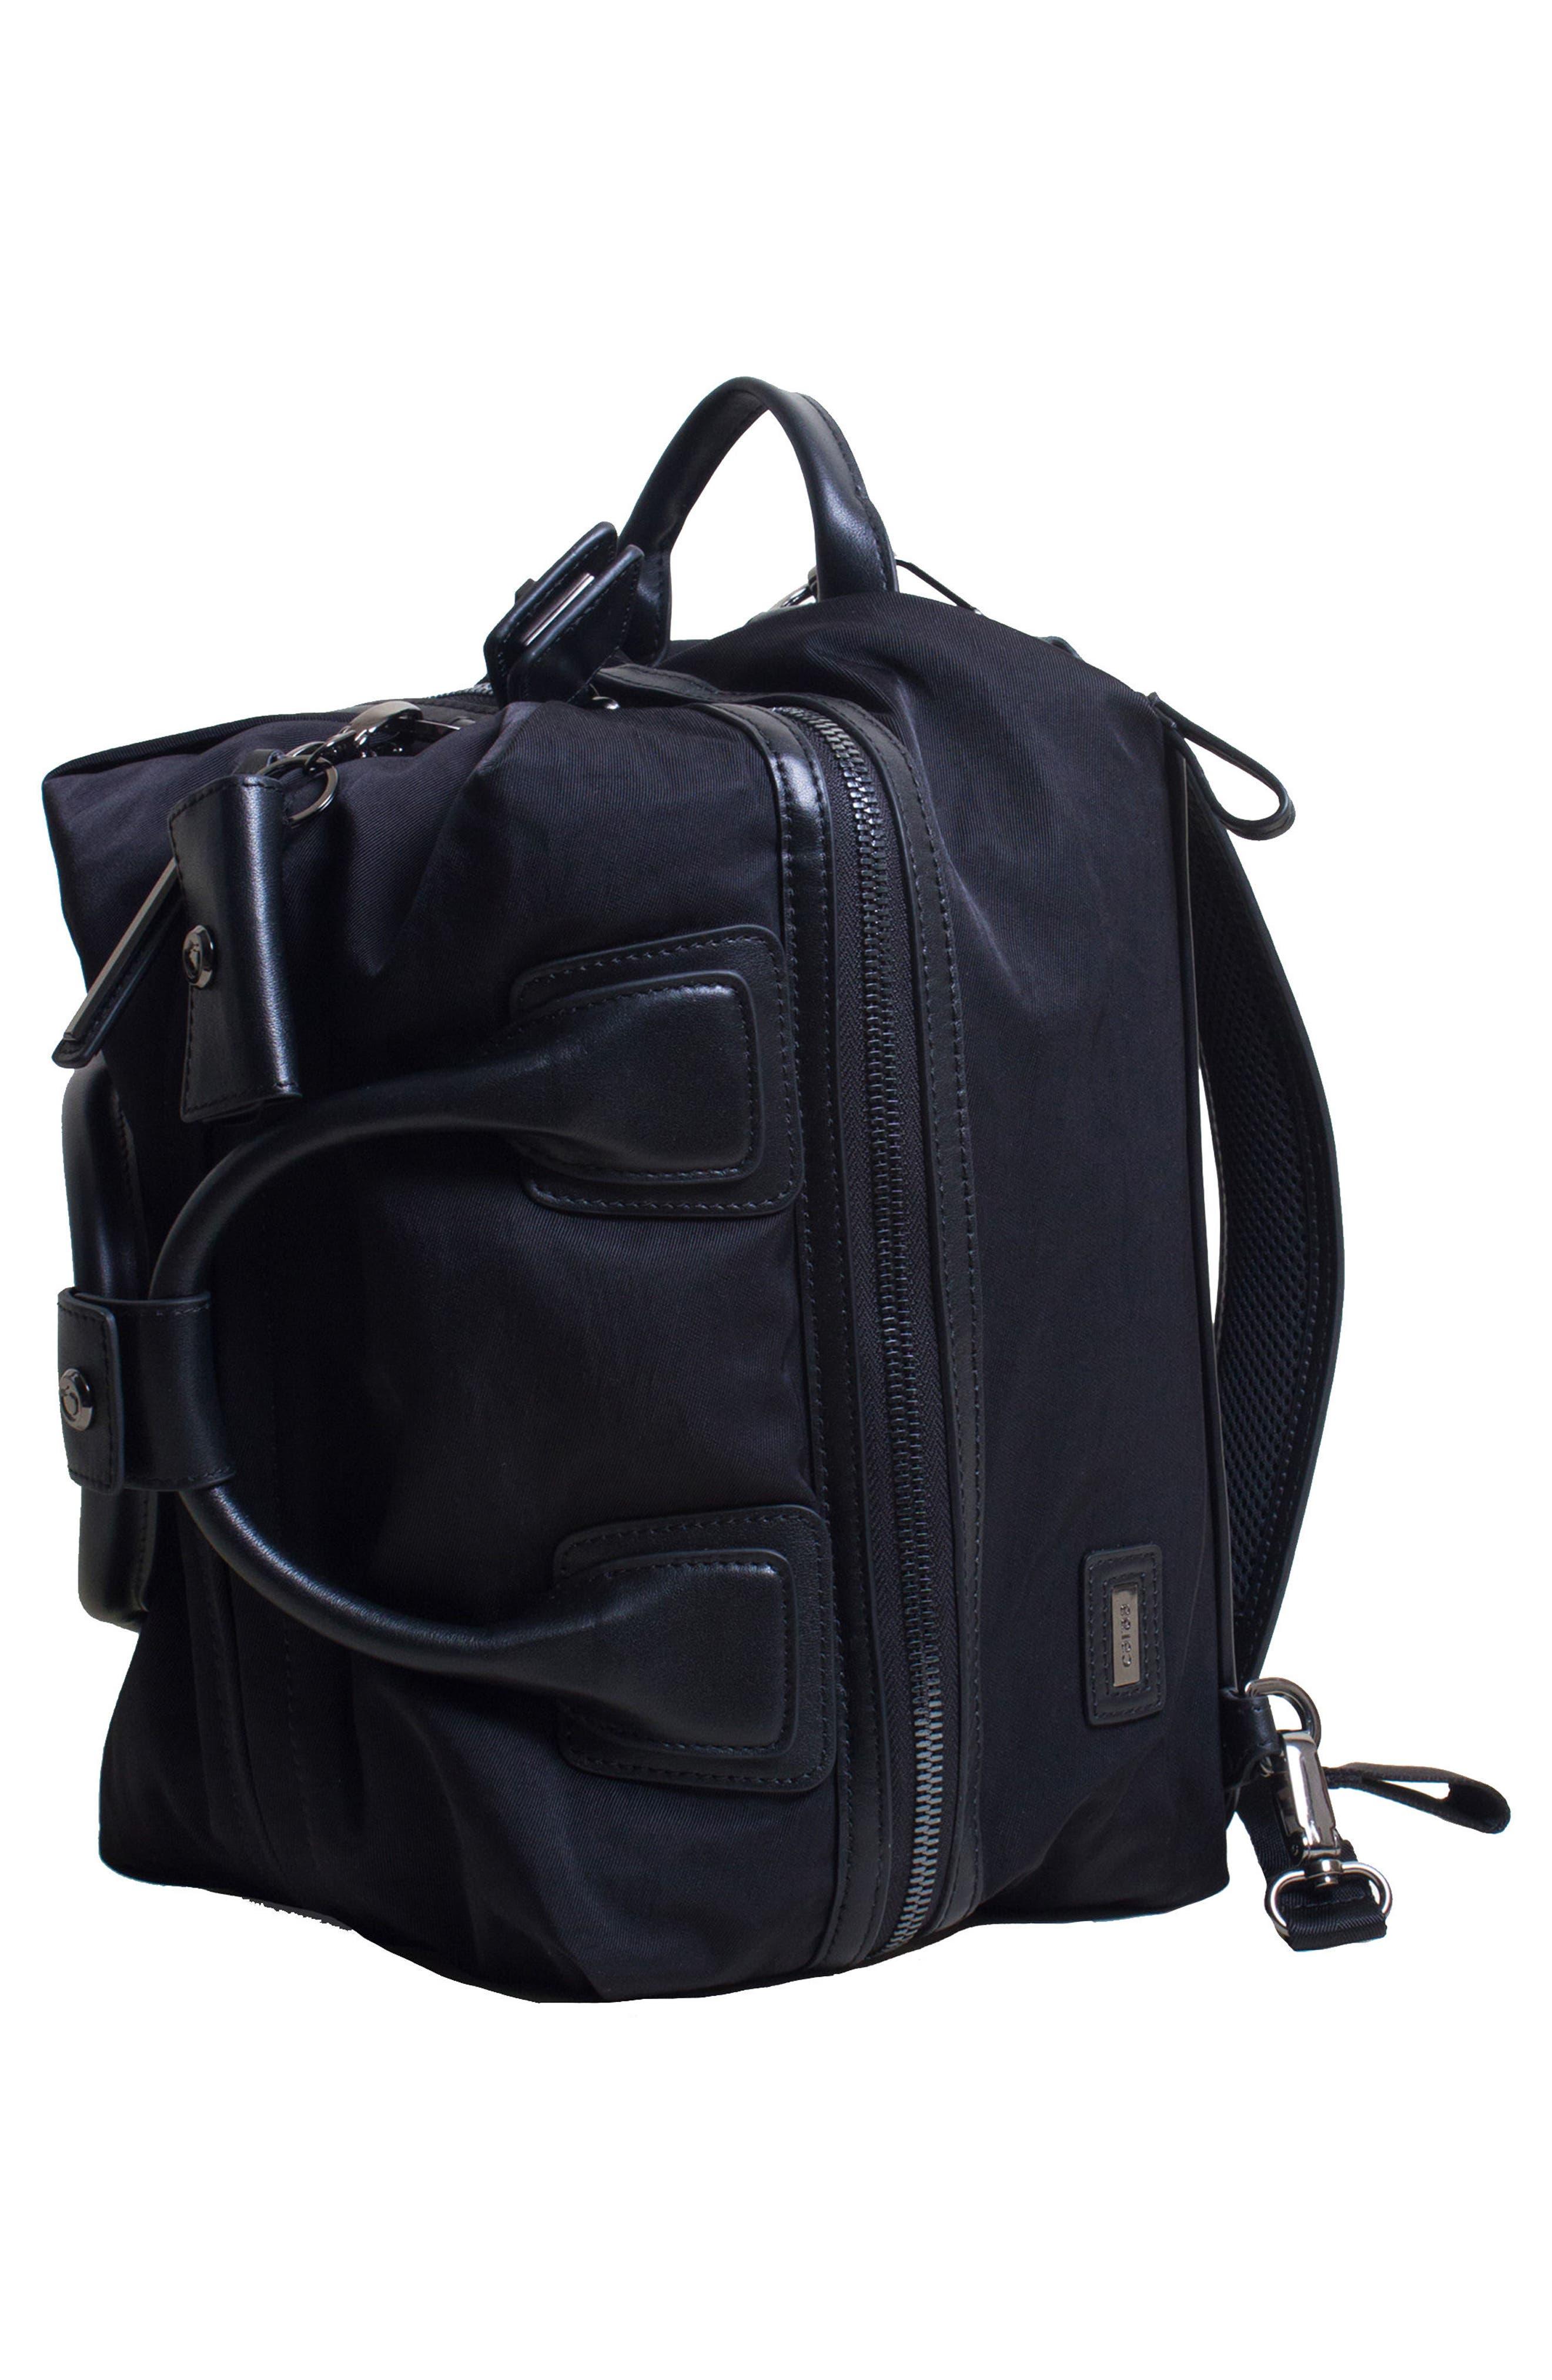 Studio Medium Duffel Backpack,                             Alternate thumbnail 5, color,                             001